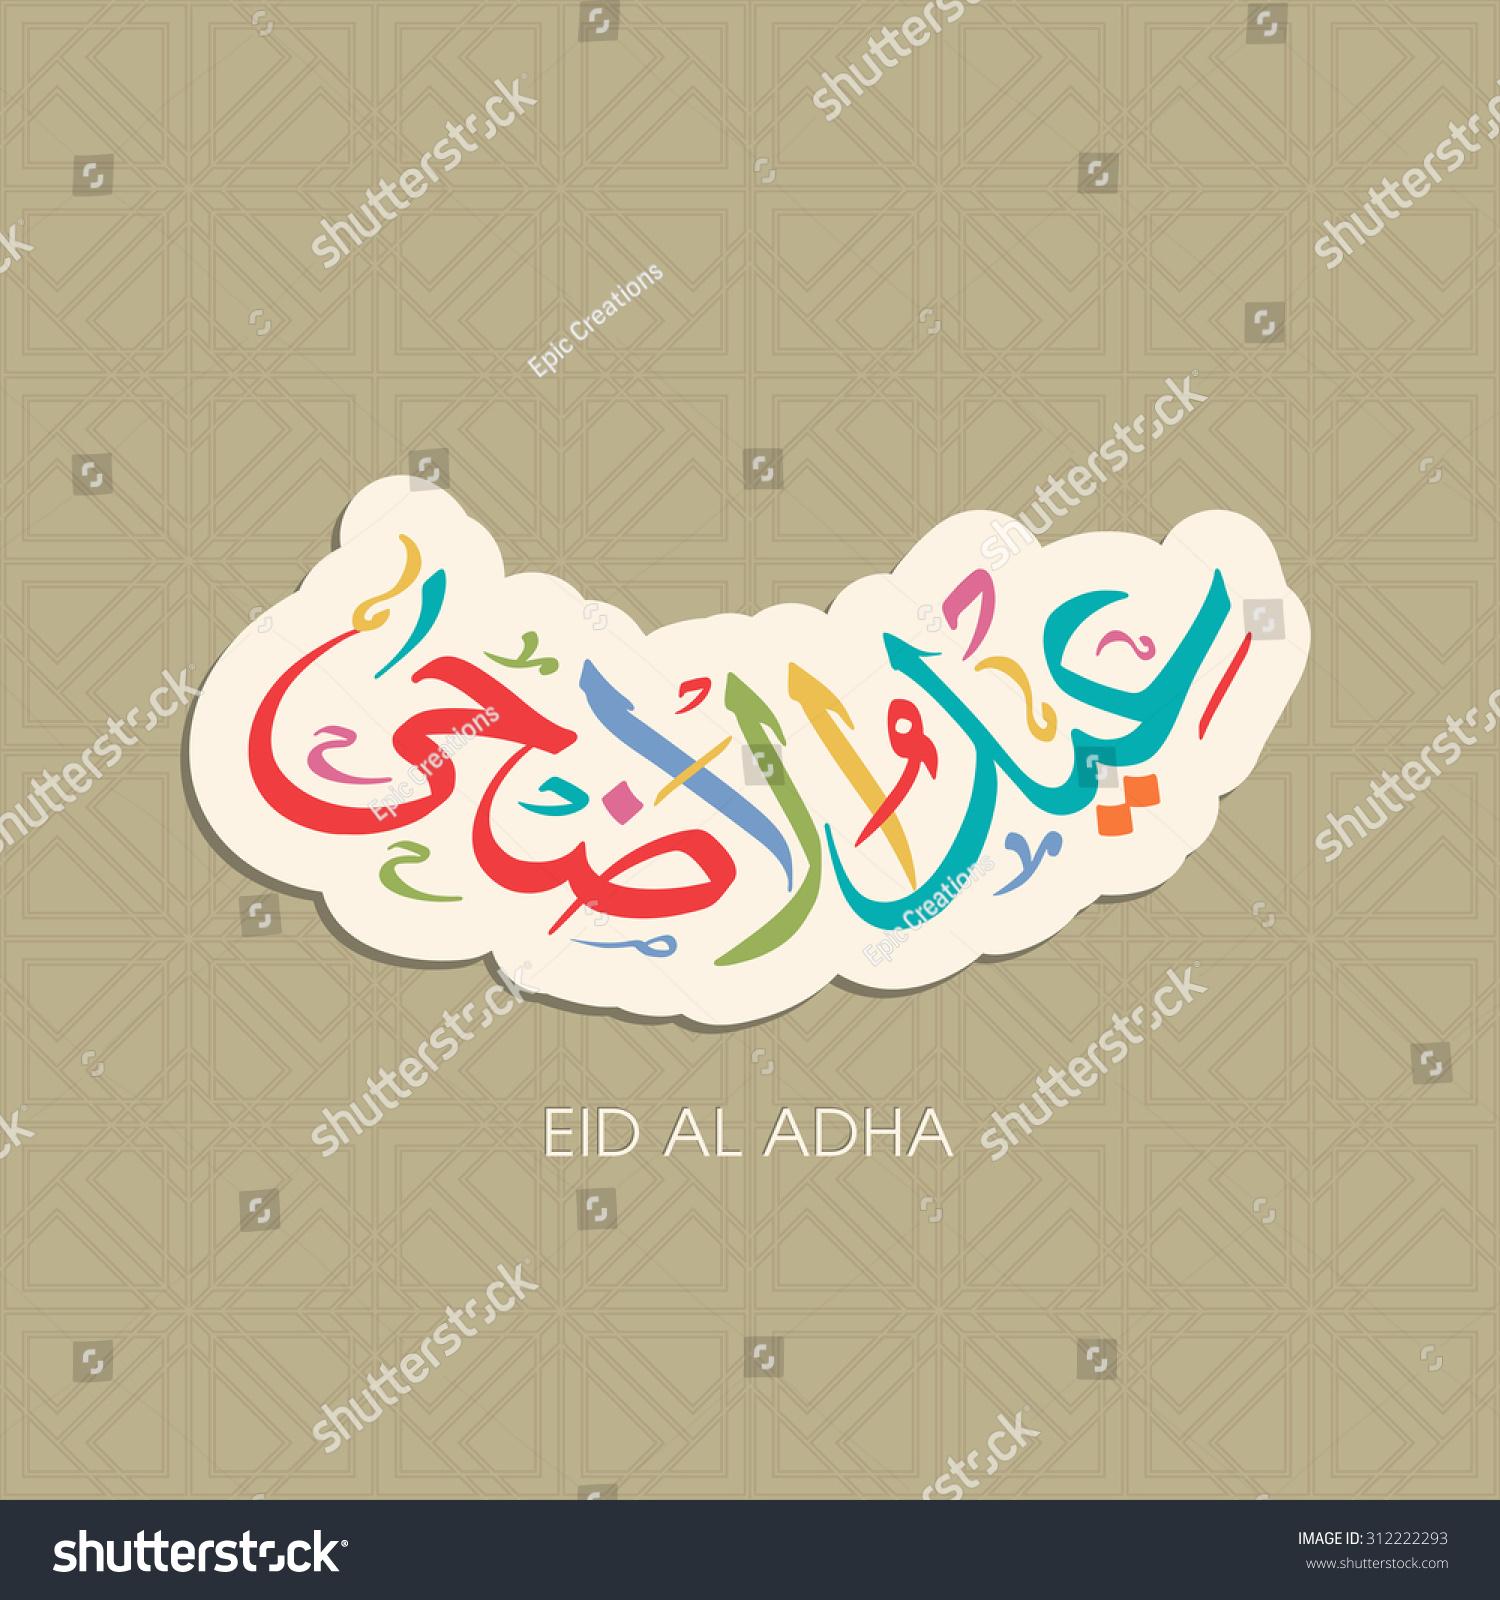 Xxx Muslim Community  Polarviewnet-5653